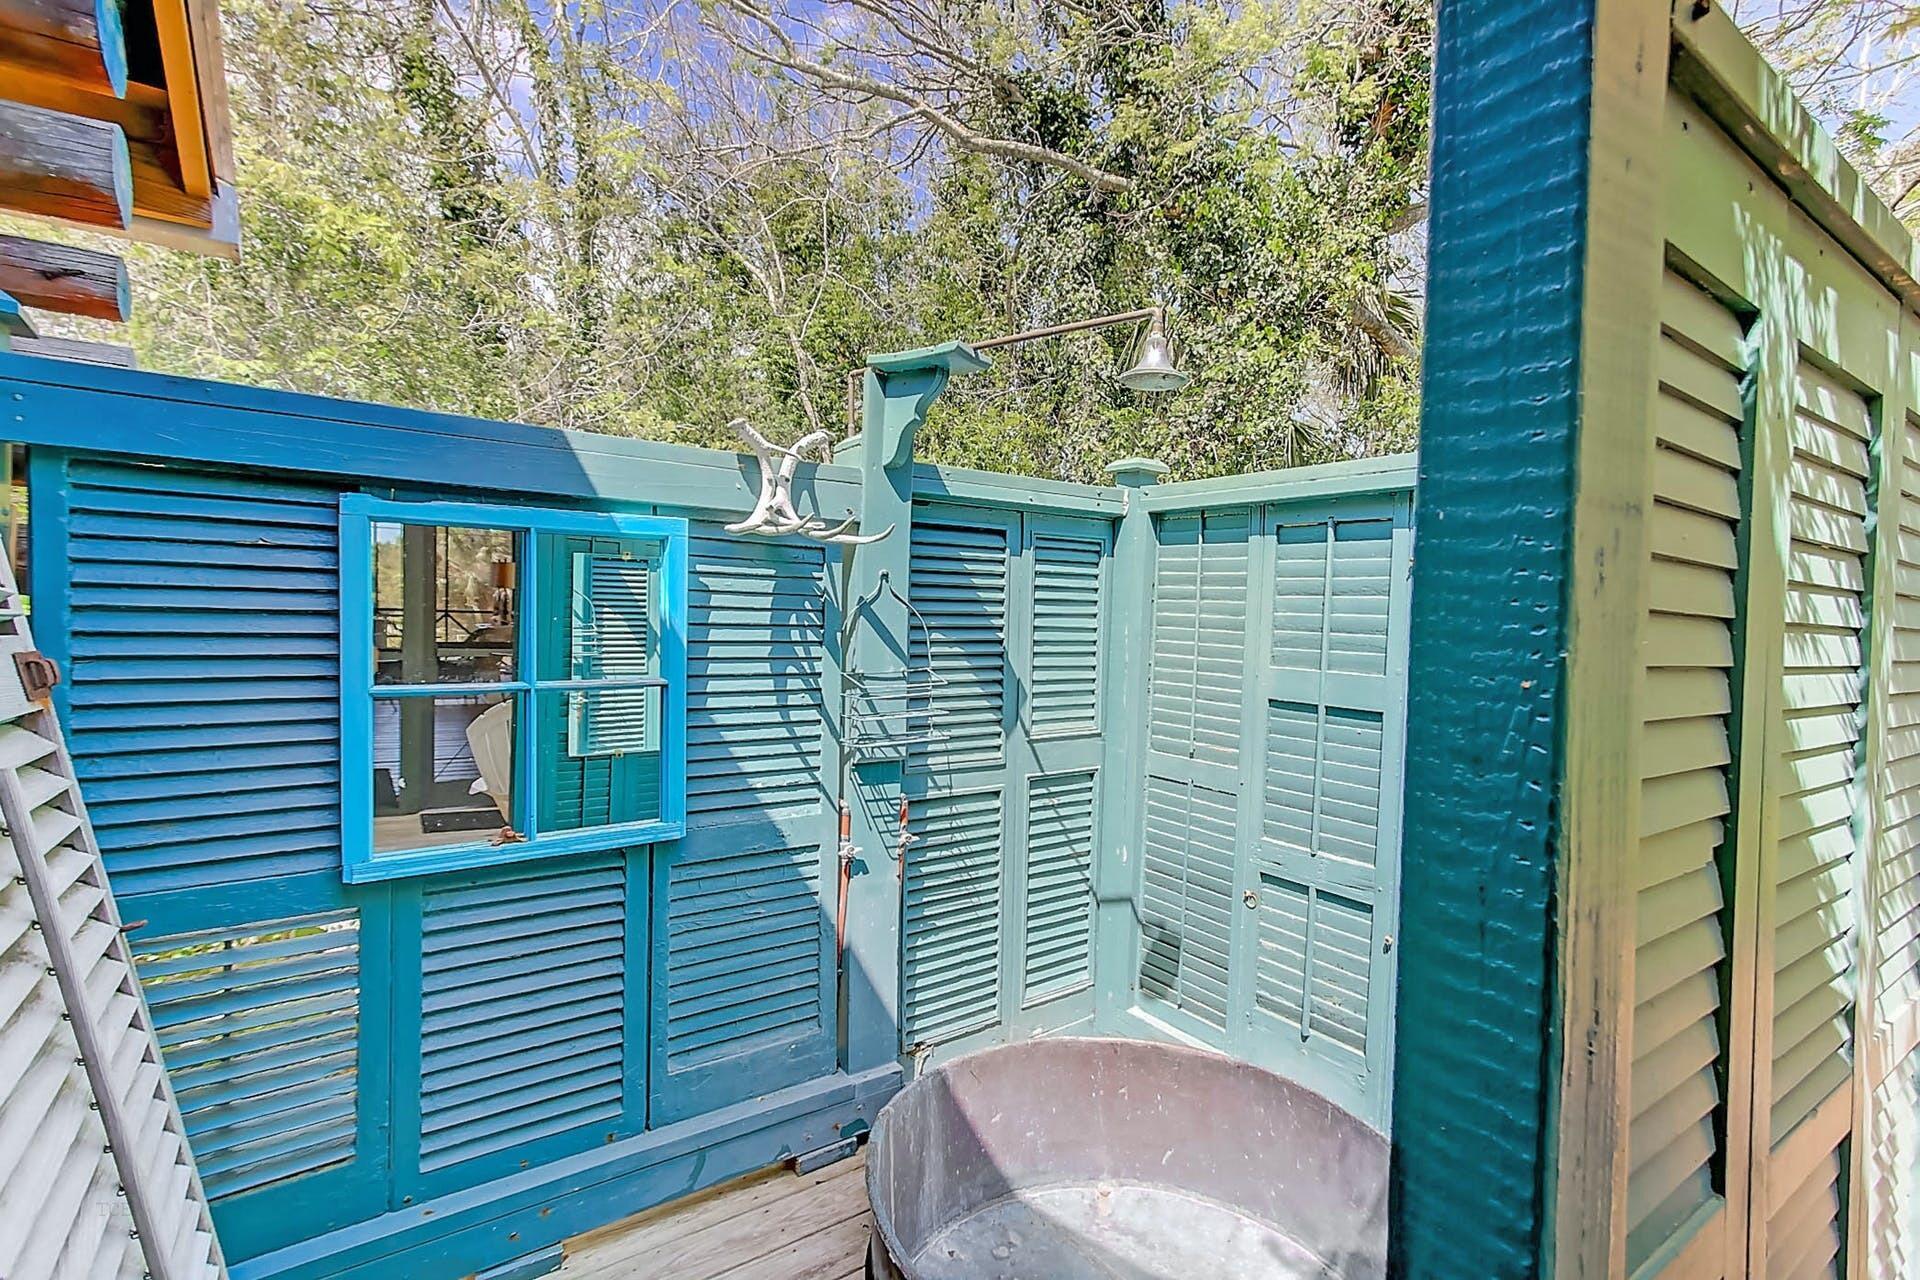 Folly Beach Homes For Sale - 306 Cooper, Folly Beach, SC - 37